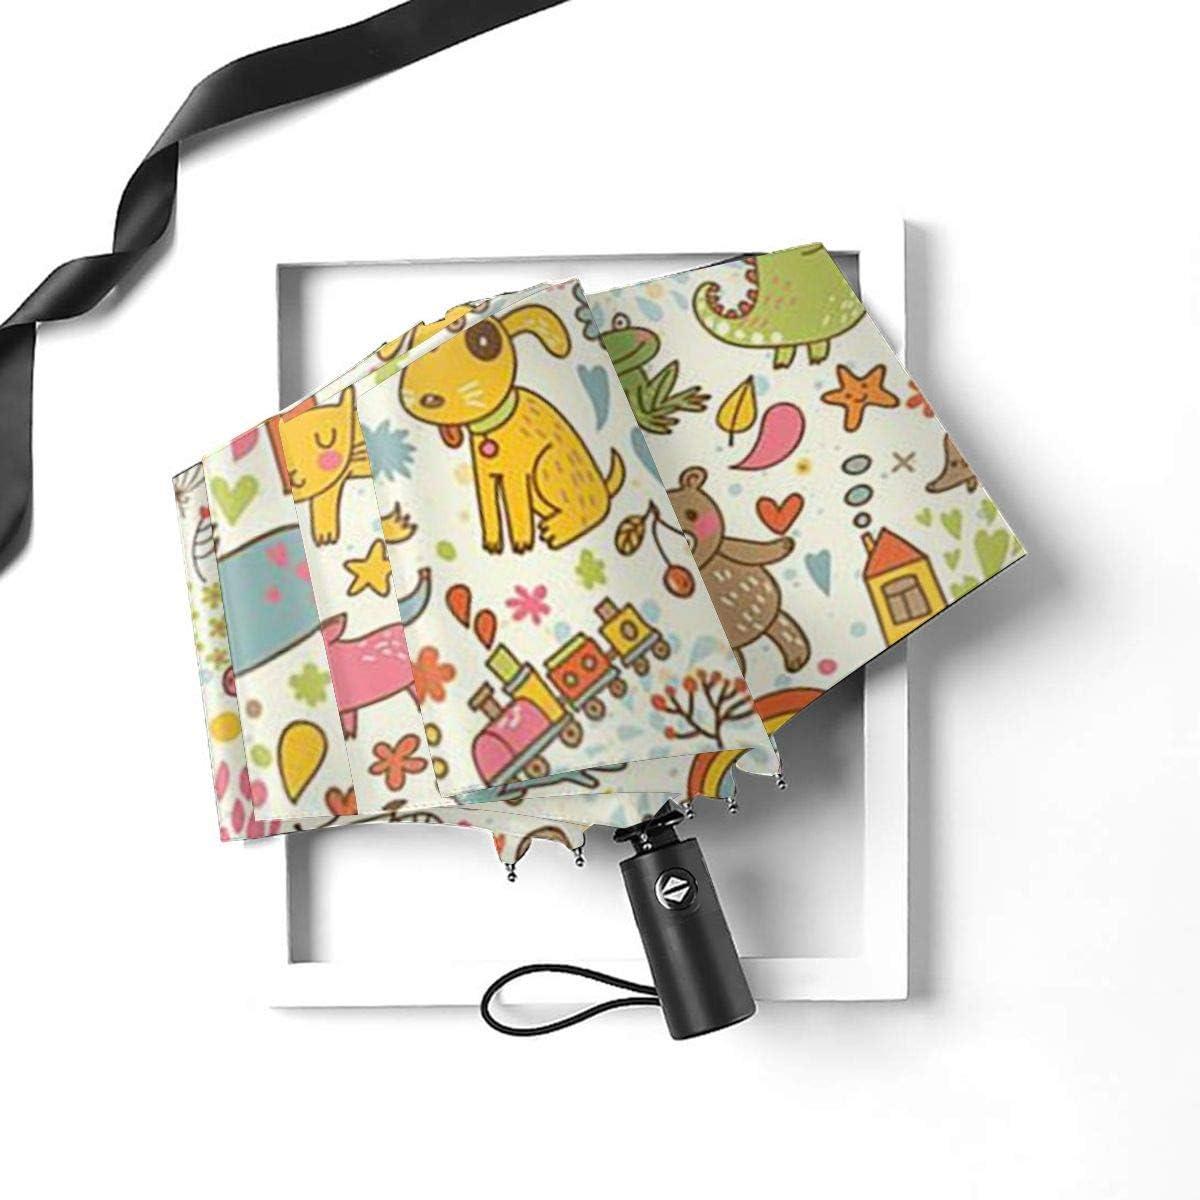 Cute Colorful Dogs Cats Animal Umbrella Compact Rain/&Wind Repellent Umbrellas Sun Protection With Anti UV Coating Travel Auto Folding Umbrella